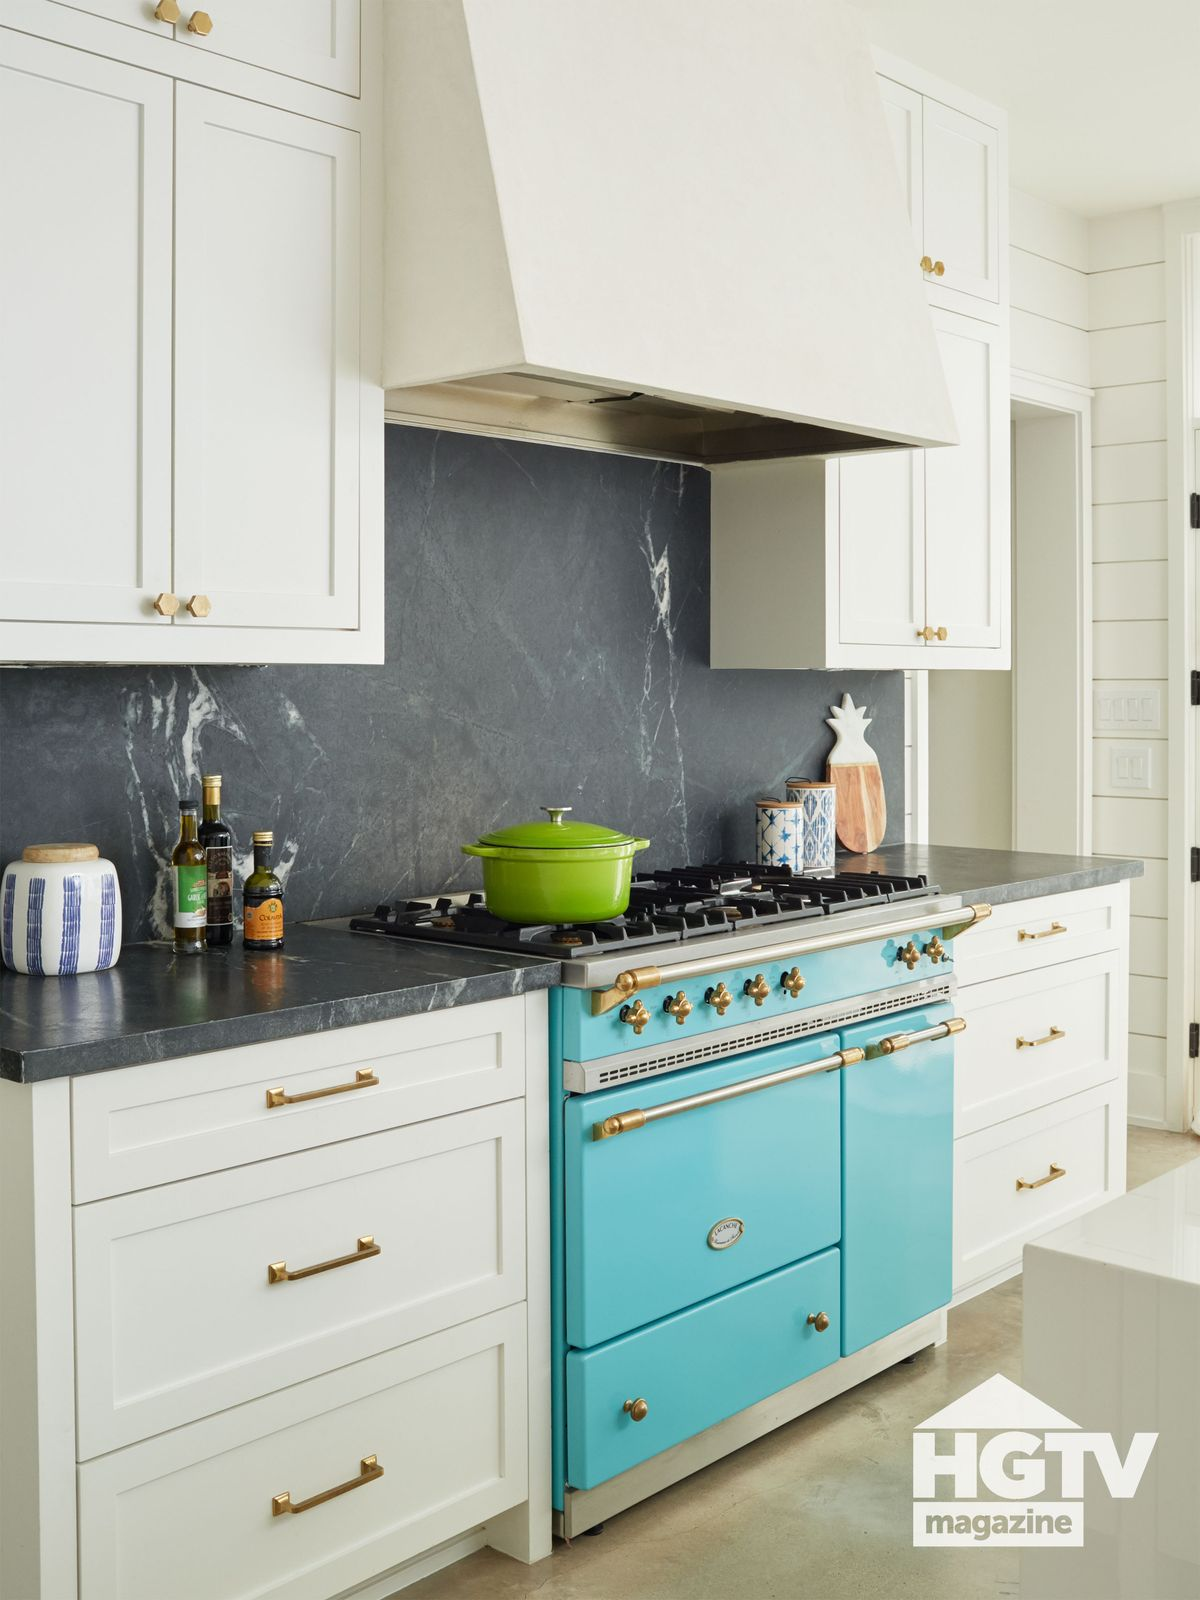 A bright blue kitchen range from HGTV Magazine